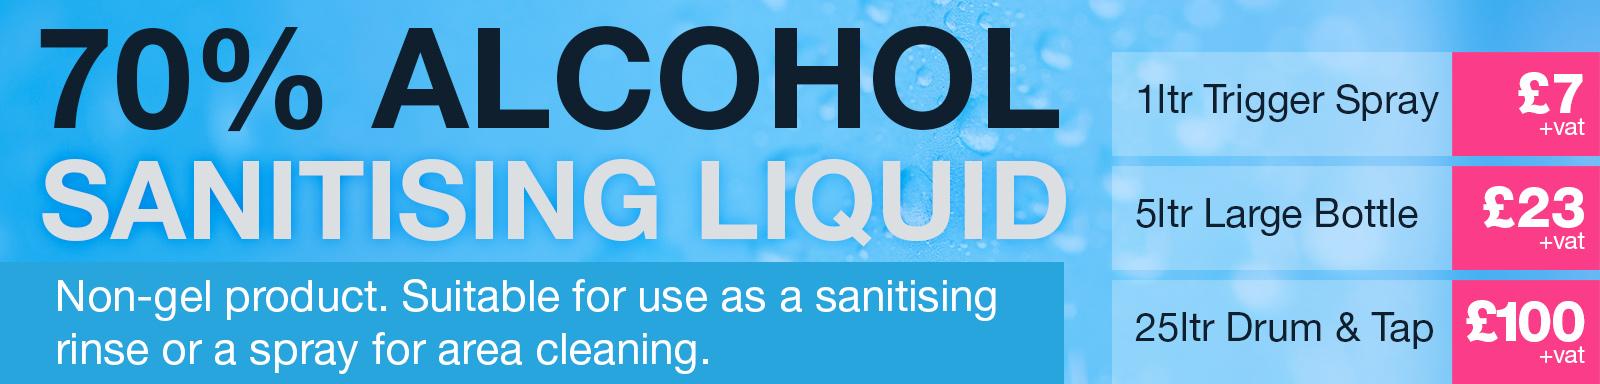 Sanitising liquid suitable for spraying